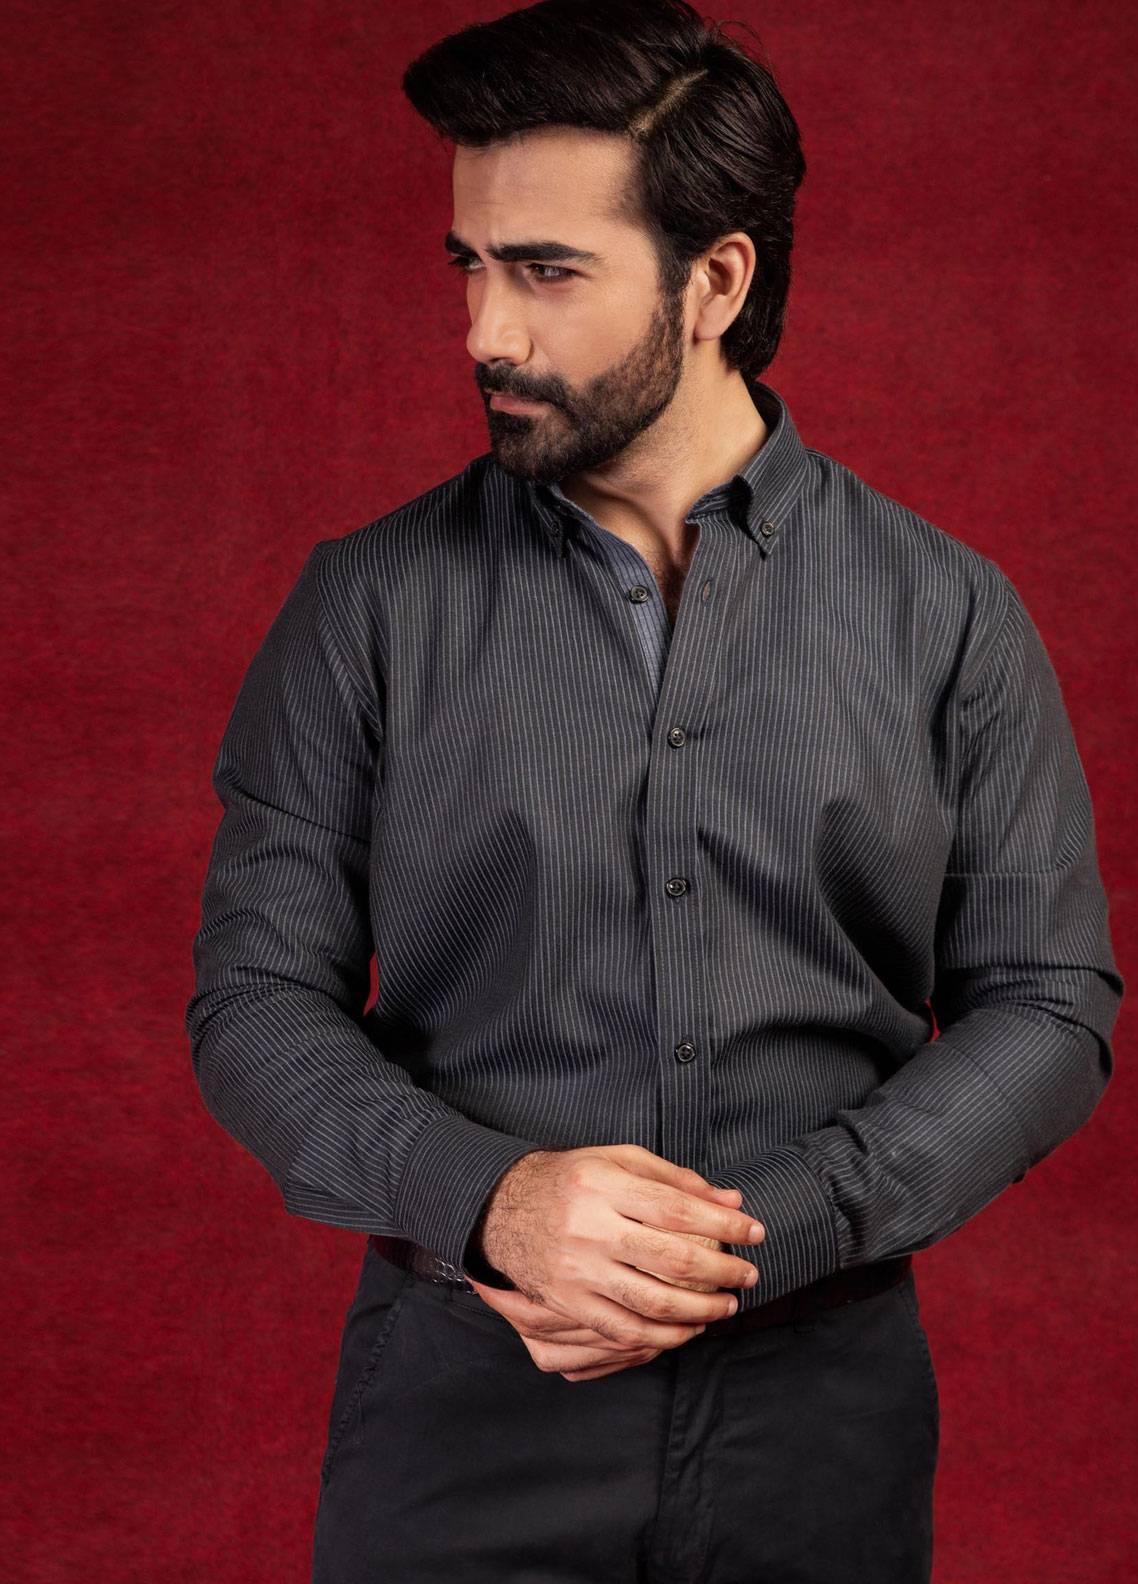 Brumano Cotton Formal Men Shirts - Black BRM-752